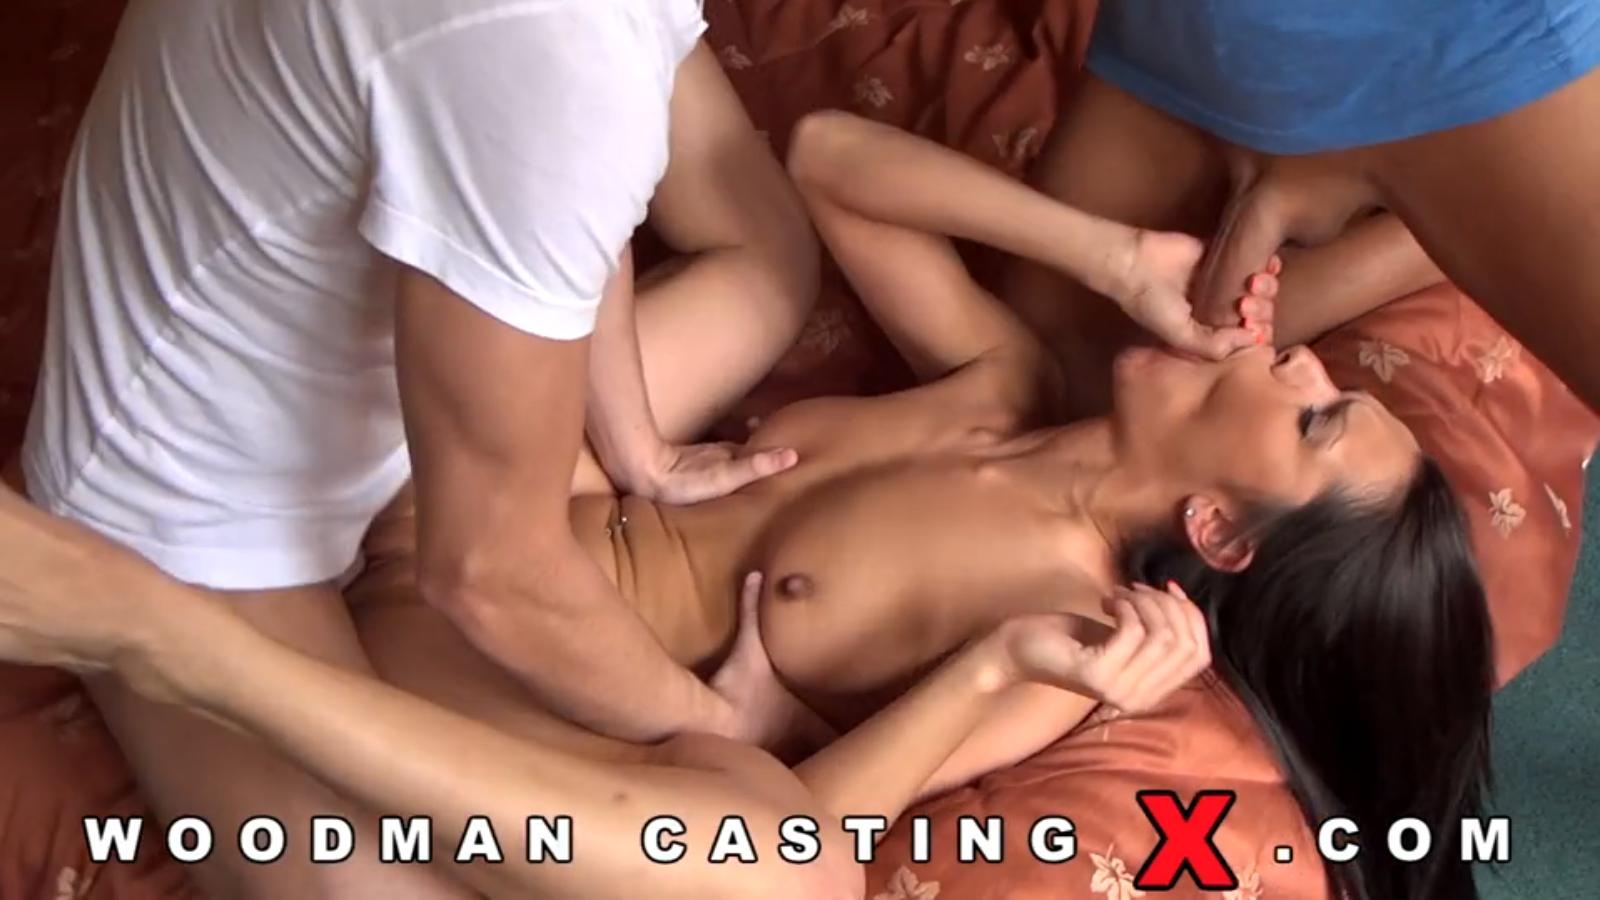 samantha rone aria alexander in girls kissing girls 17 scene